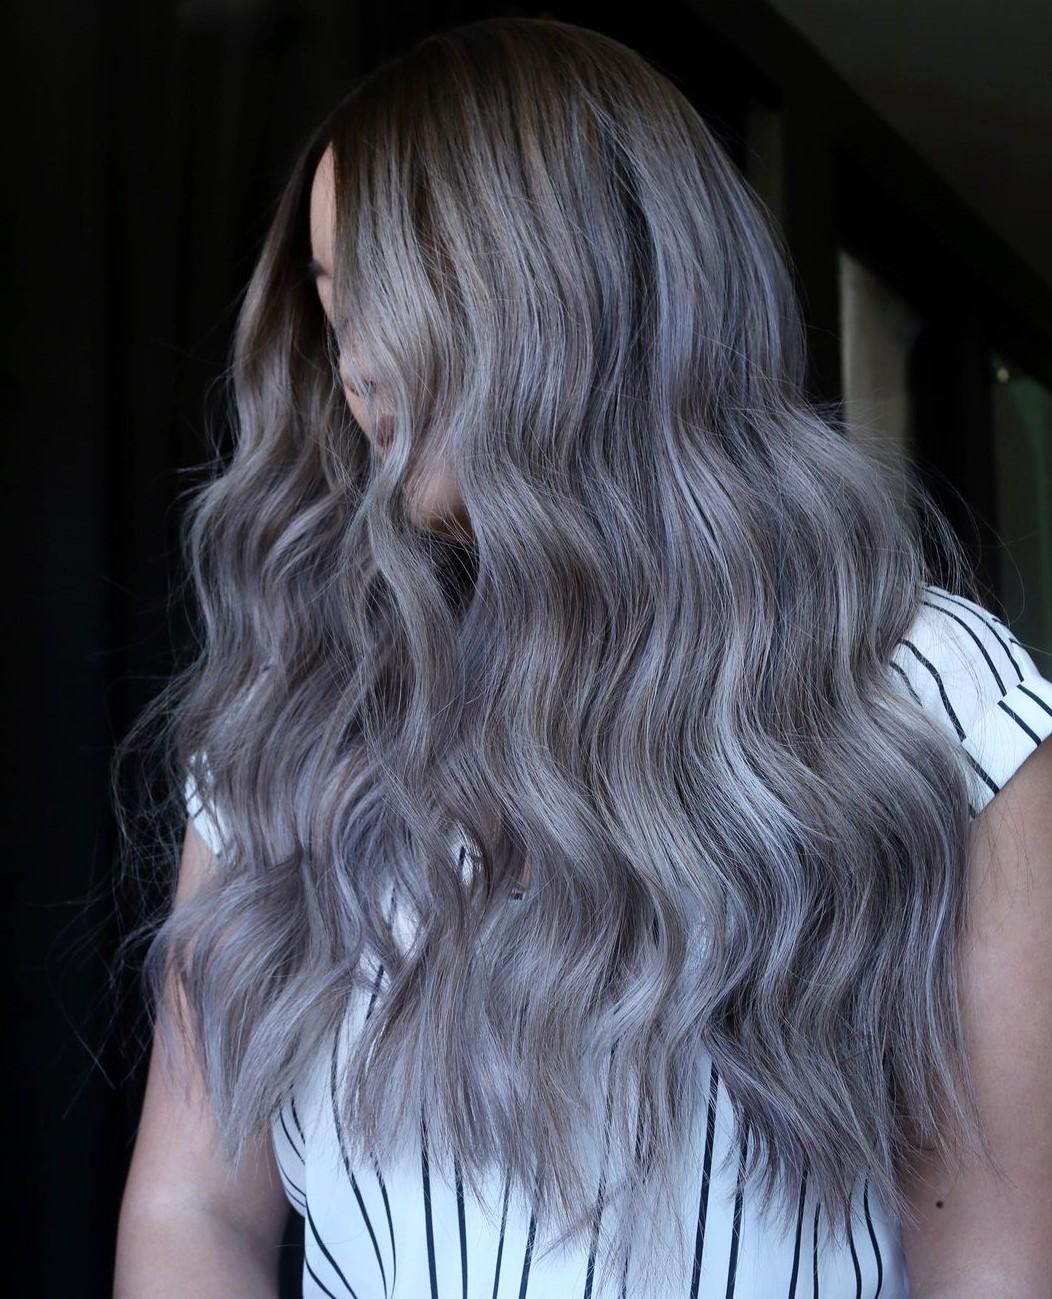 Smokey Highlights for Long Hair